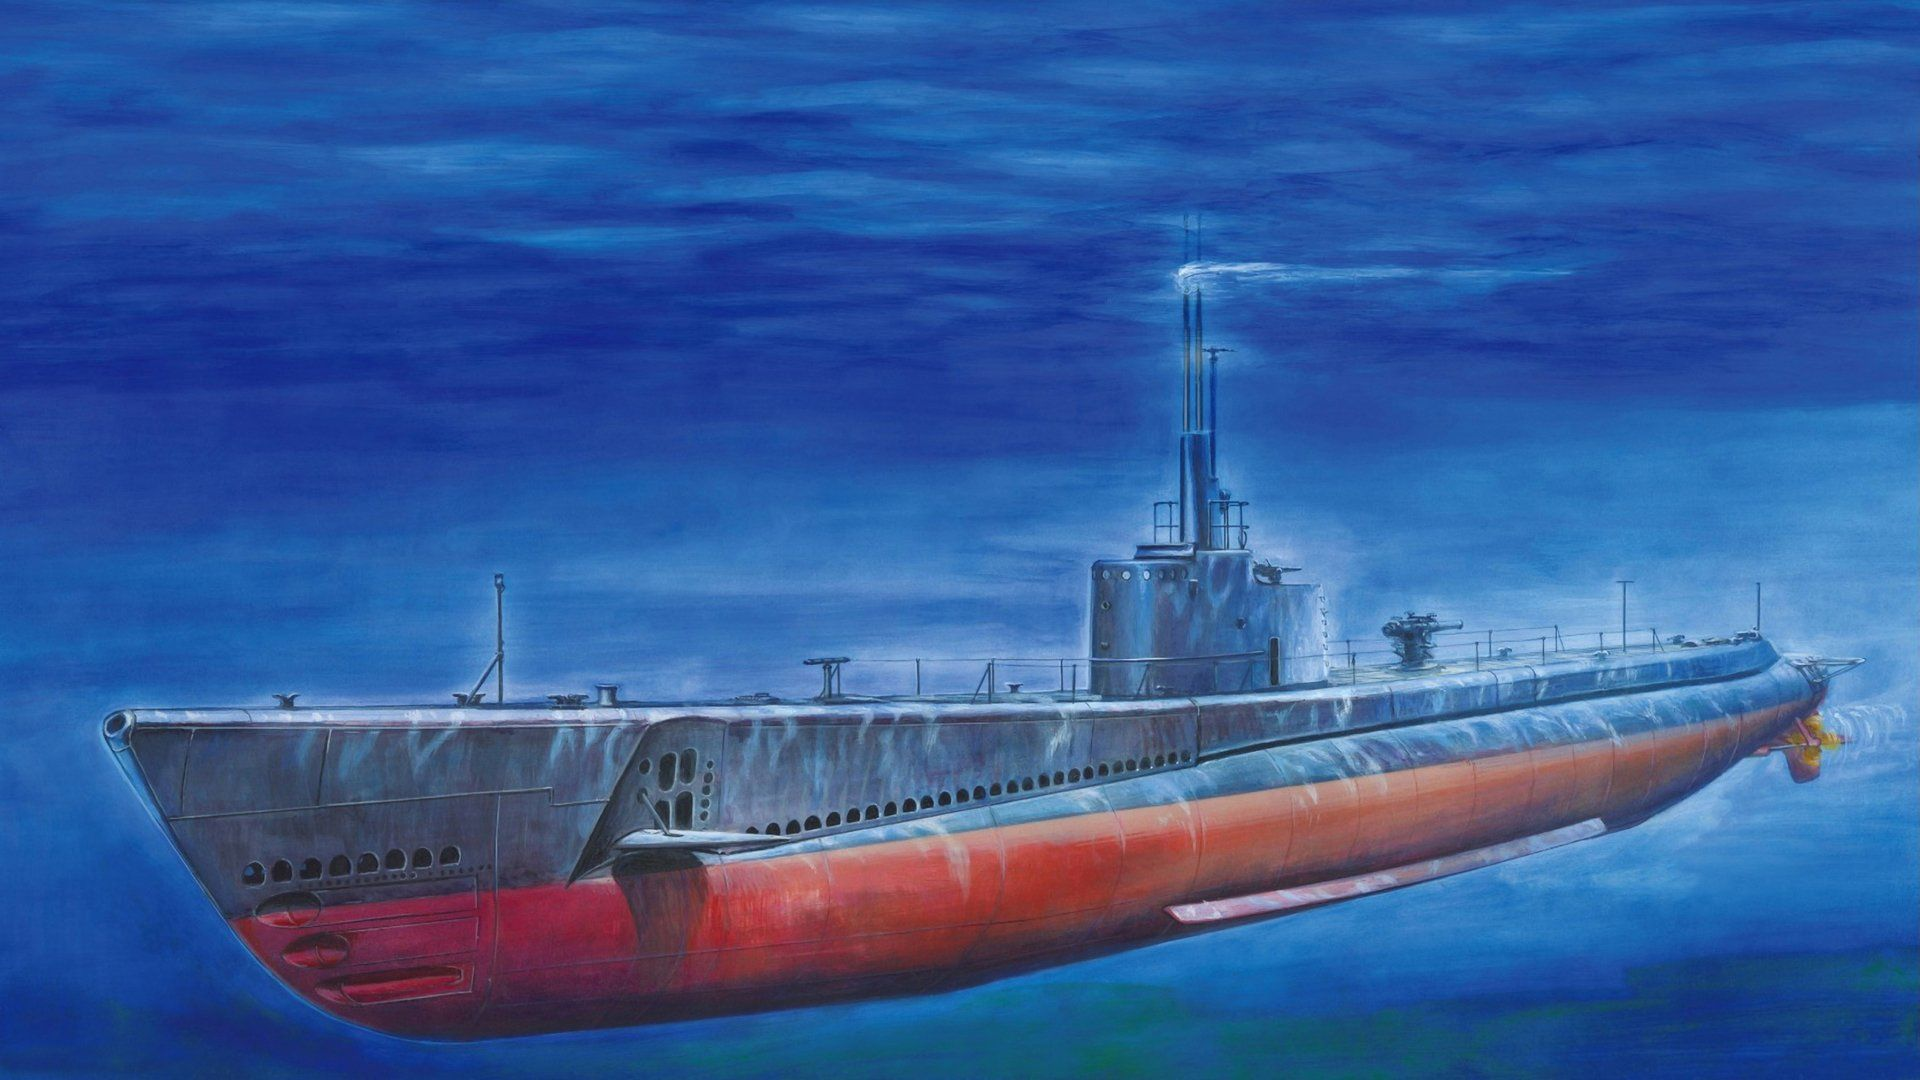 SUBMARINE  http://www.wallpaperup.com/410366/SUBMARINE_ship_boat_military_navy.html